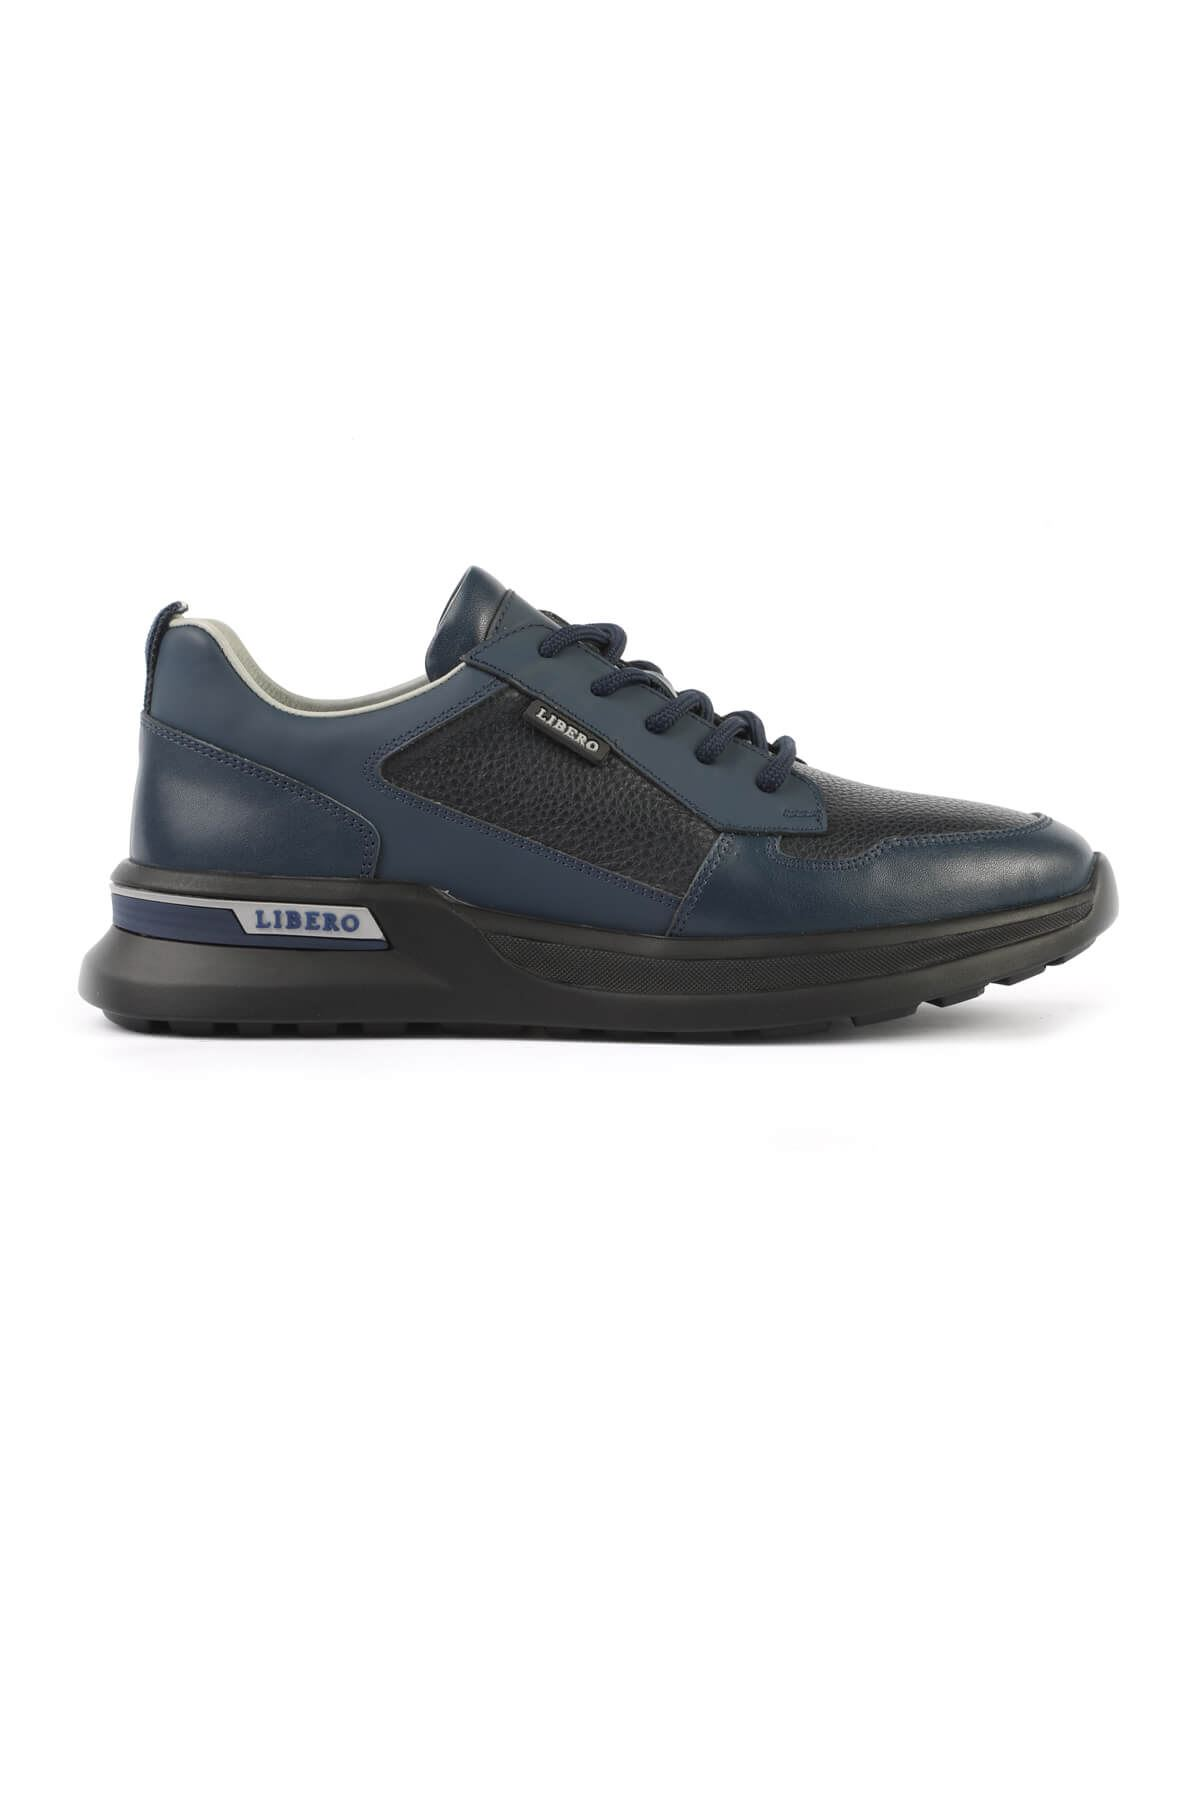 Libero 3141 Navy Blue Sport Shoes